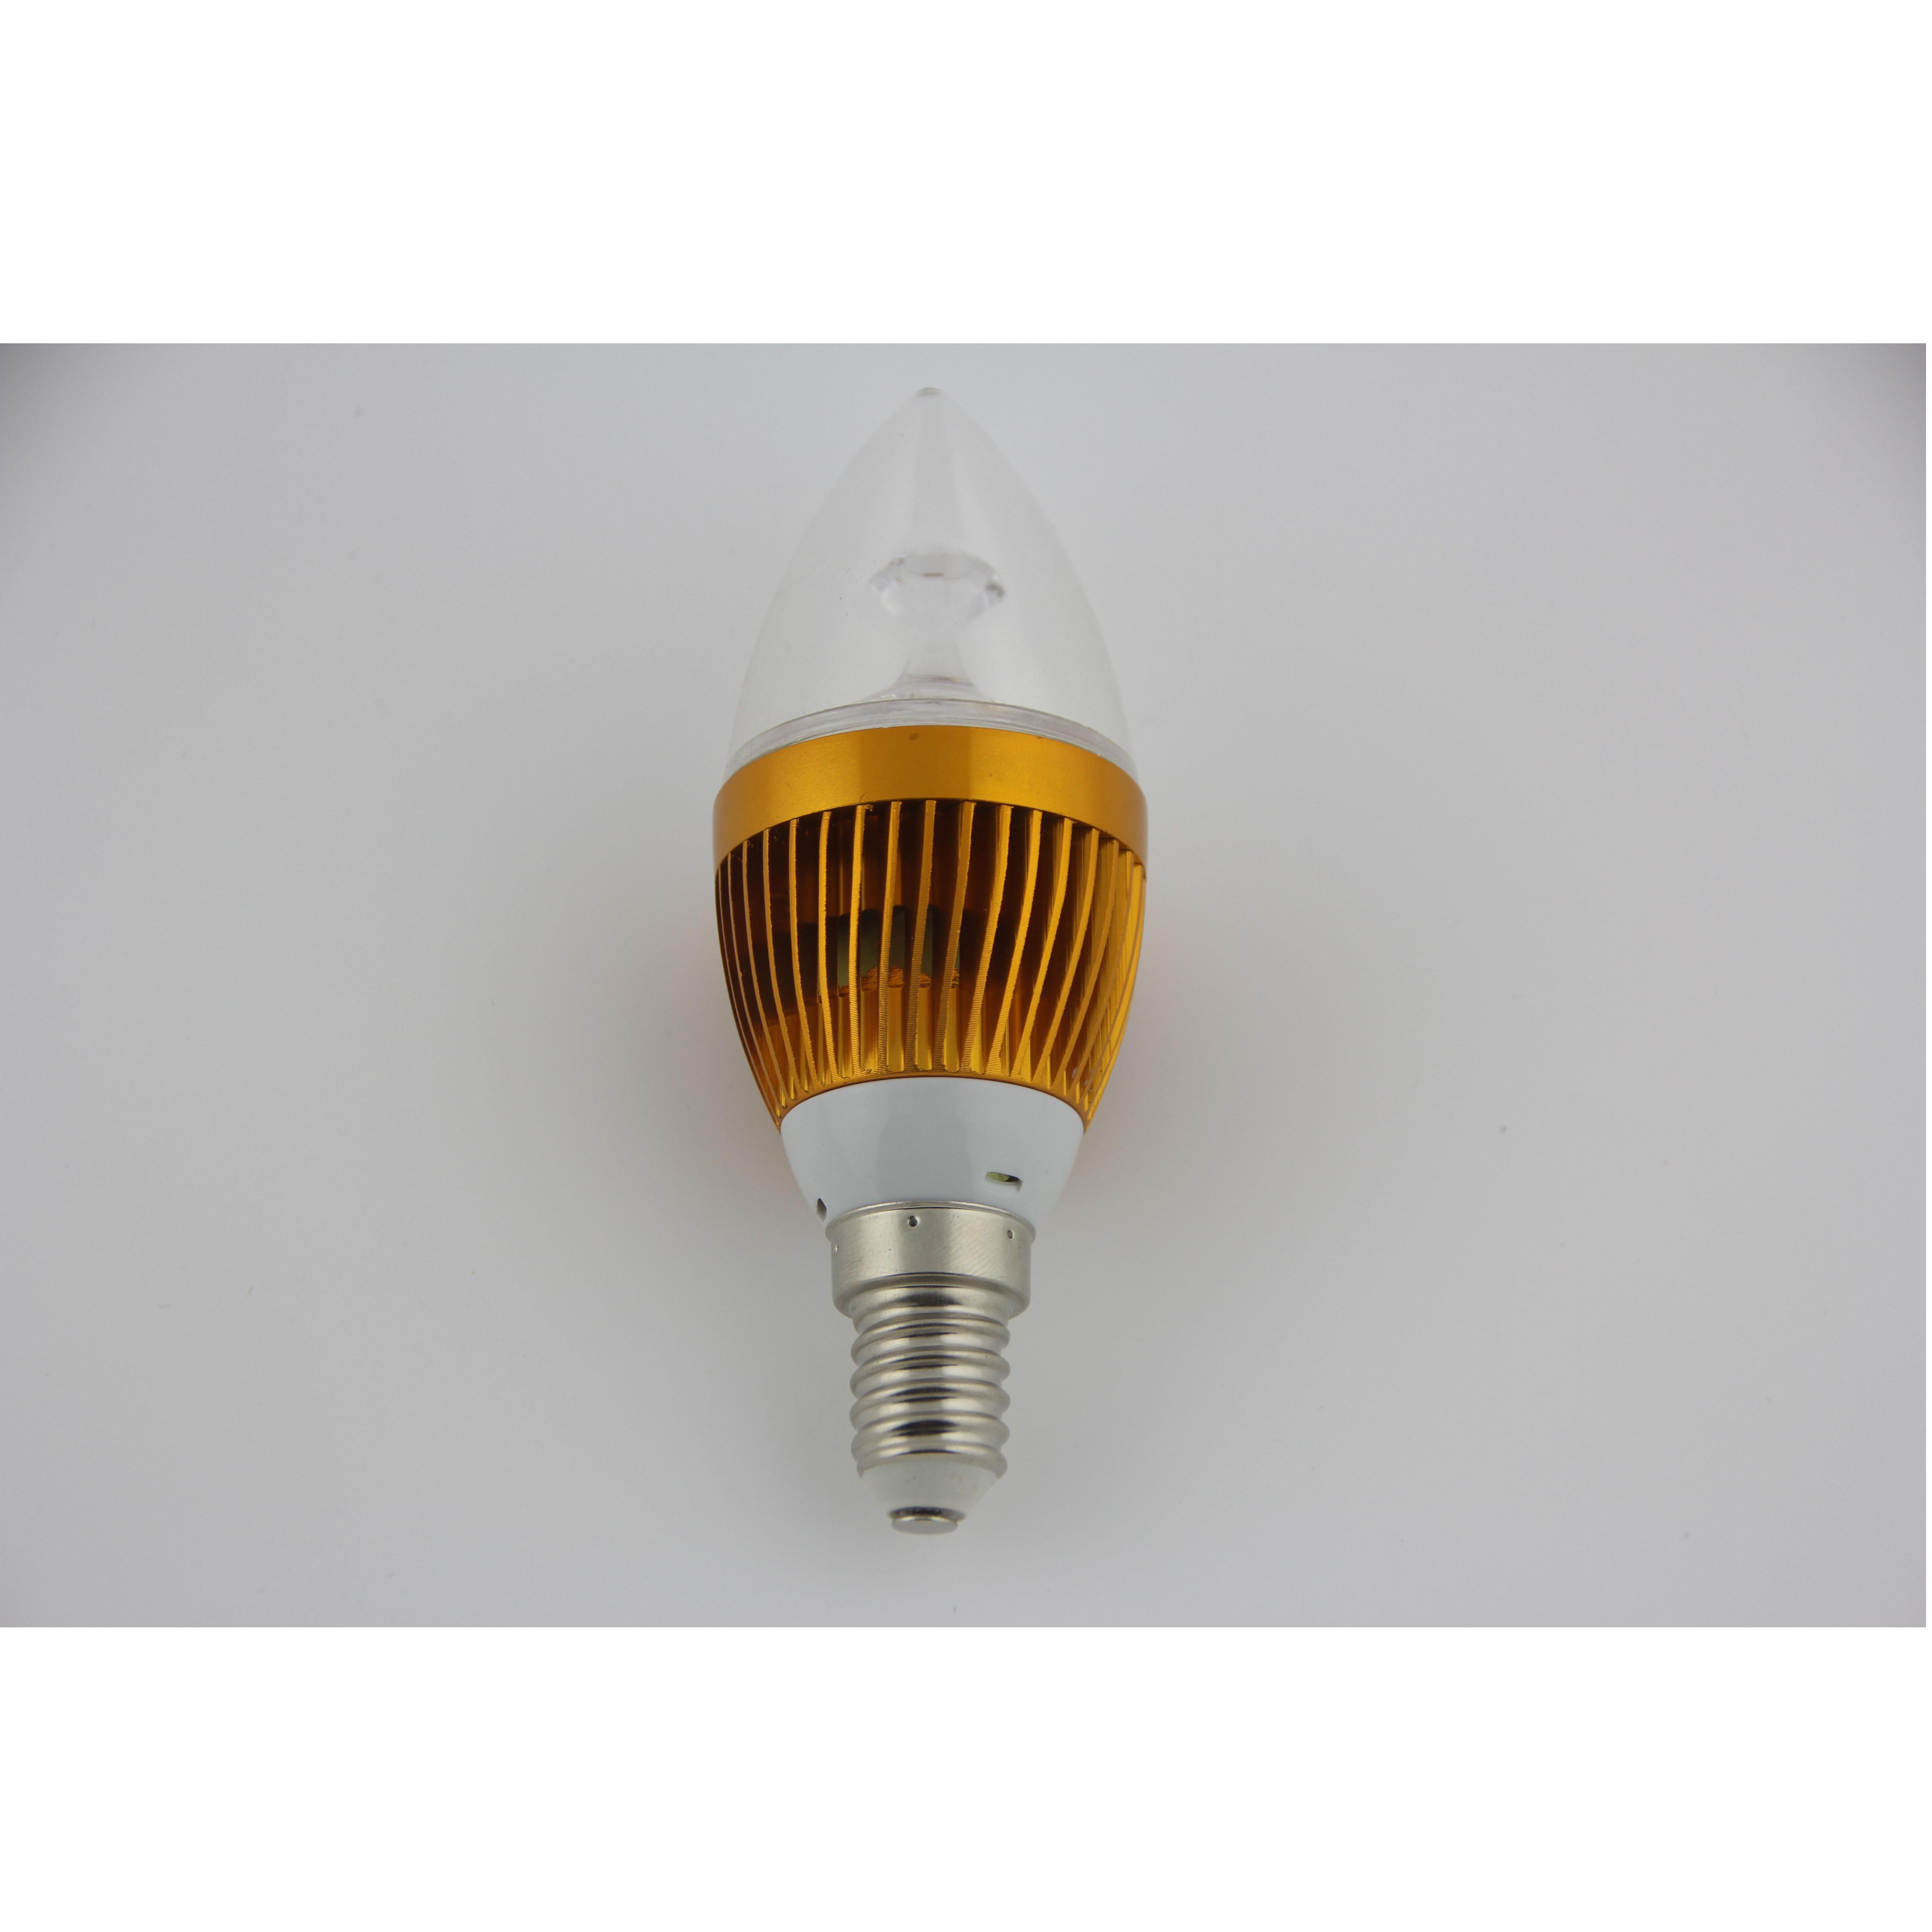 LED Candle Bulb High Quality Gloden Aluminum 3x1W E14 180lm  85-265V LED Global Bulb Light Spotlight Downlight